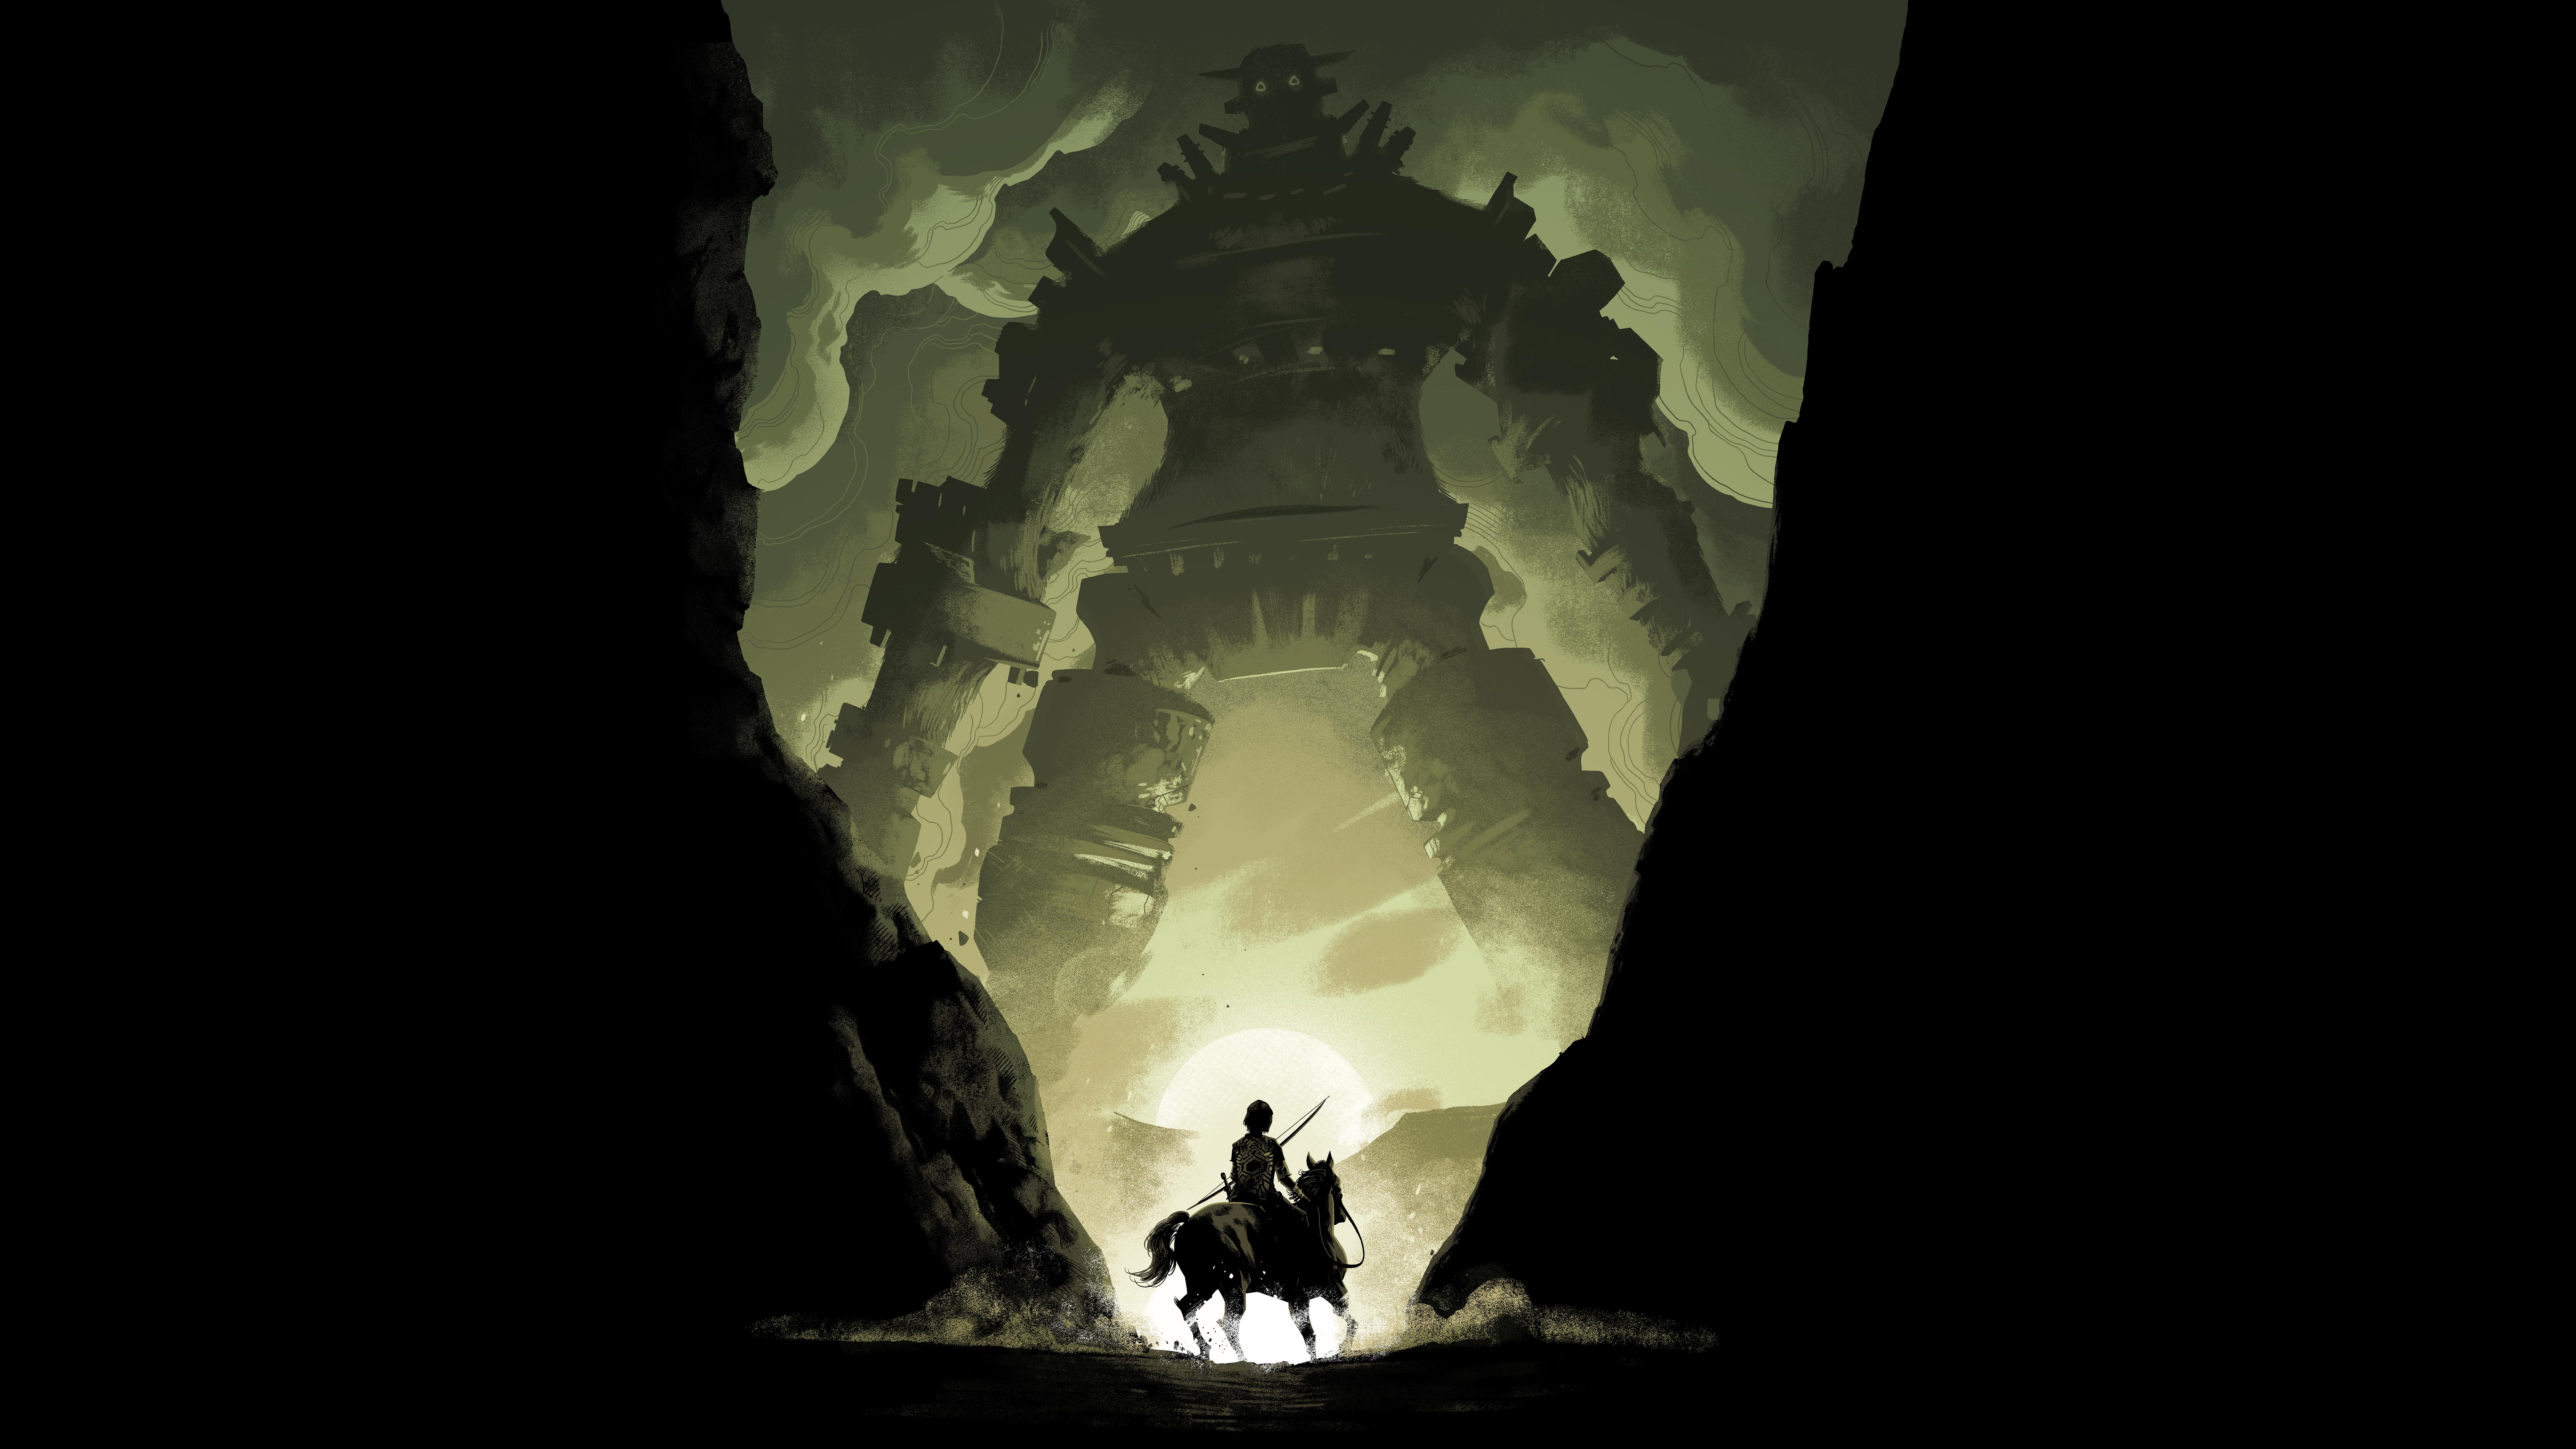 2048x1152 Shadow Of The Colossus 2018 2048x1152 Resolution Hd 4k